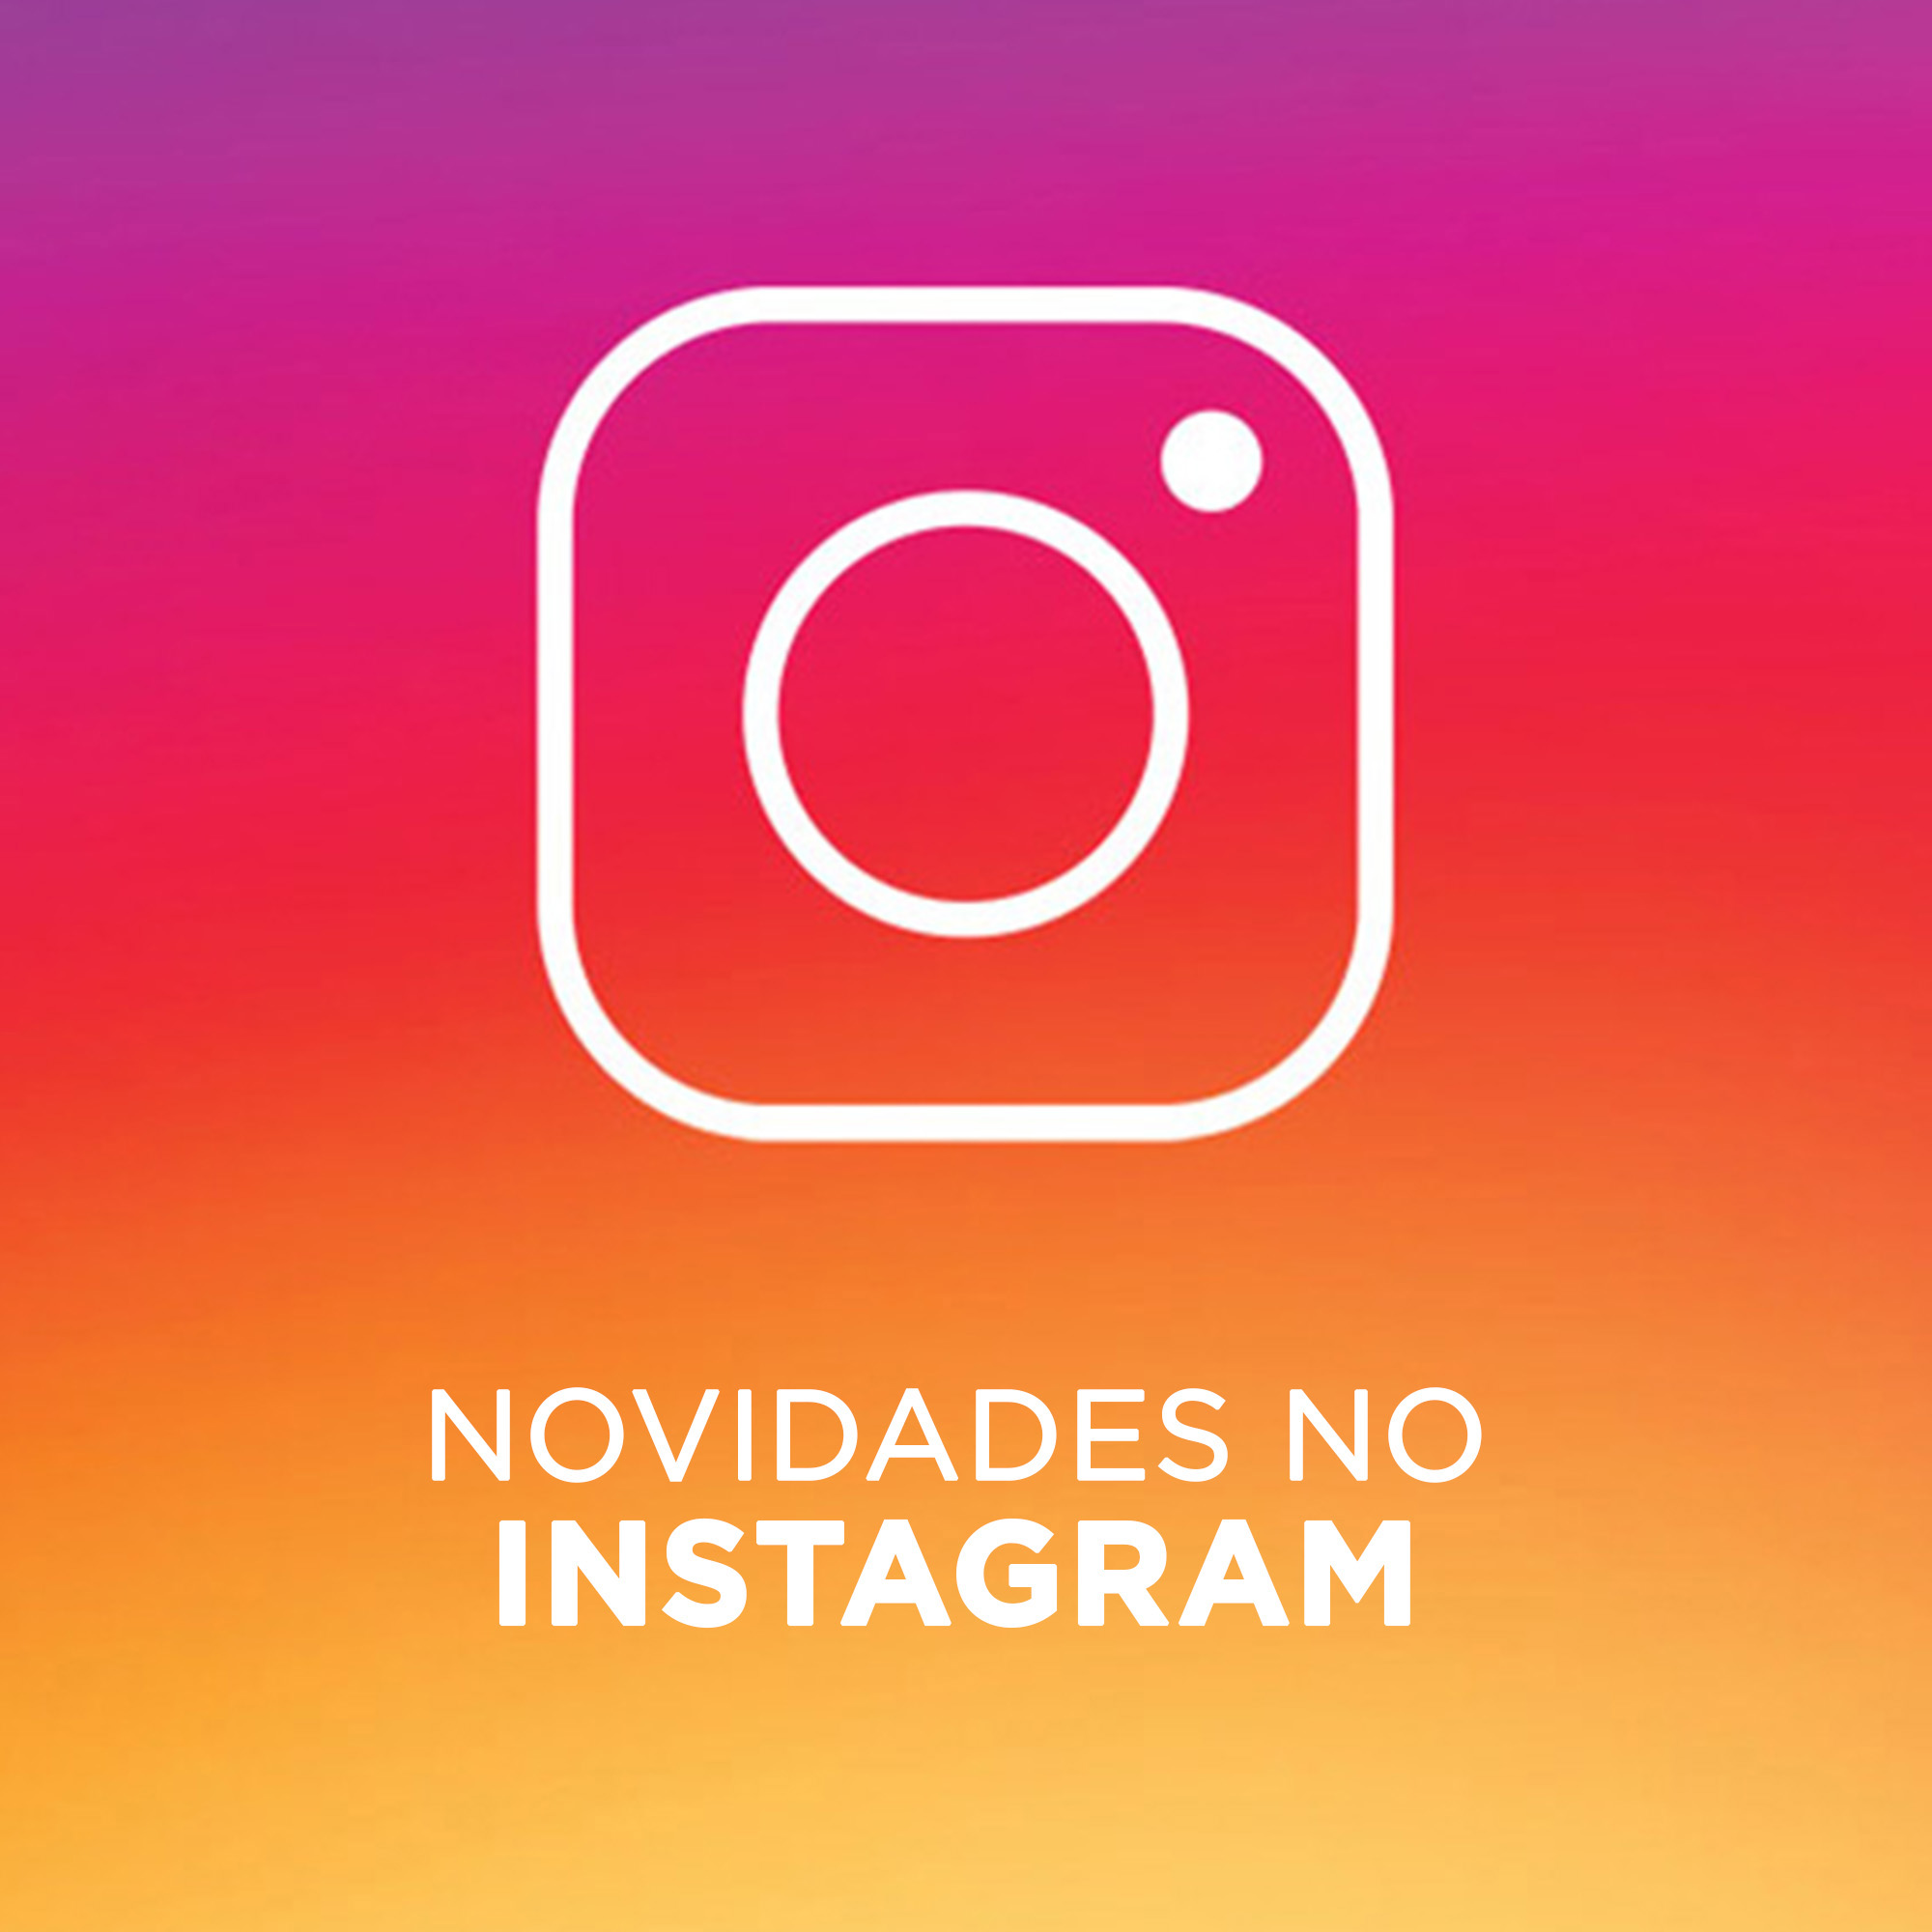 novos recursos no Instagram